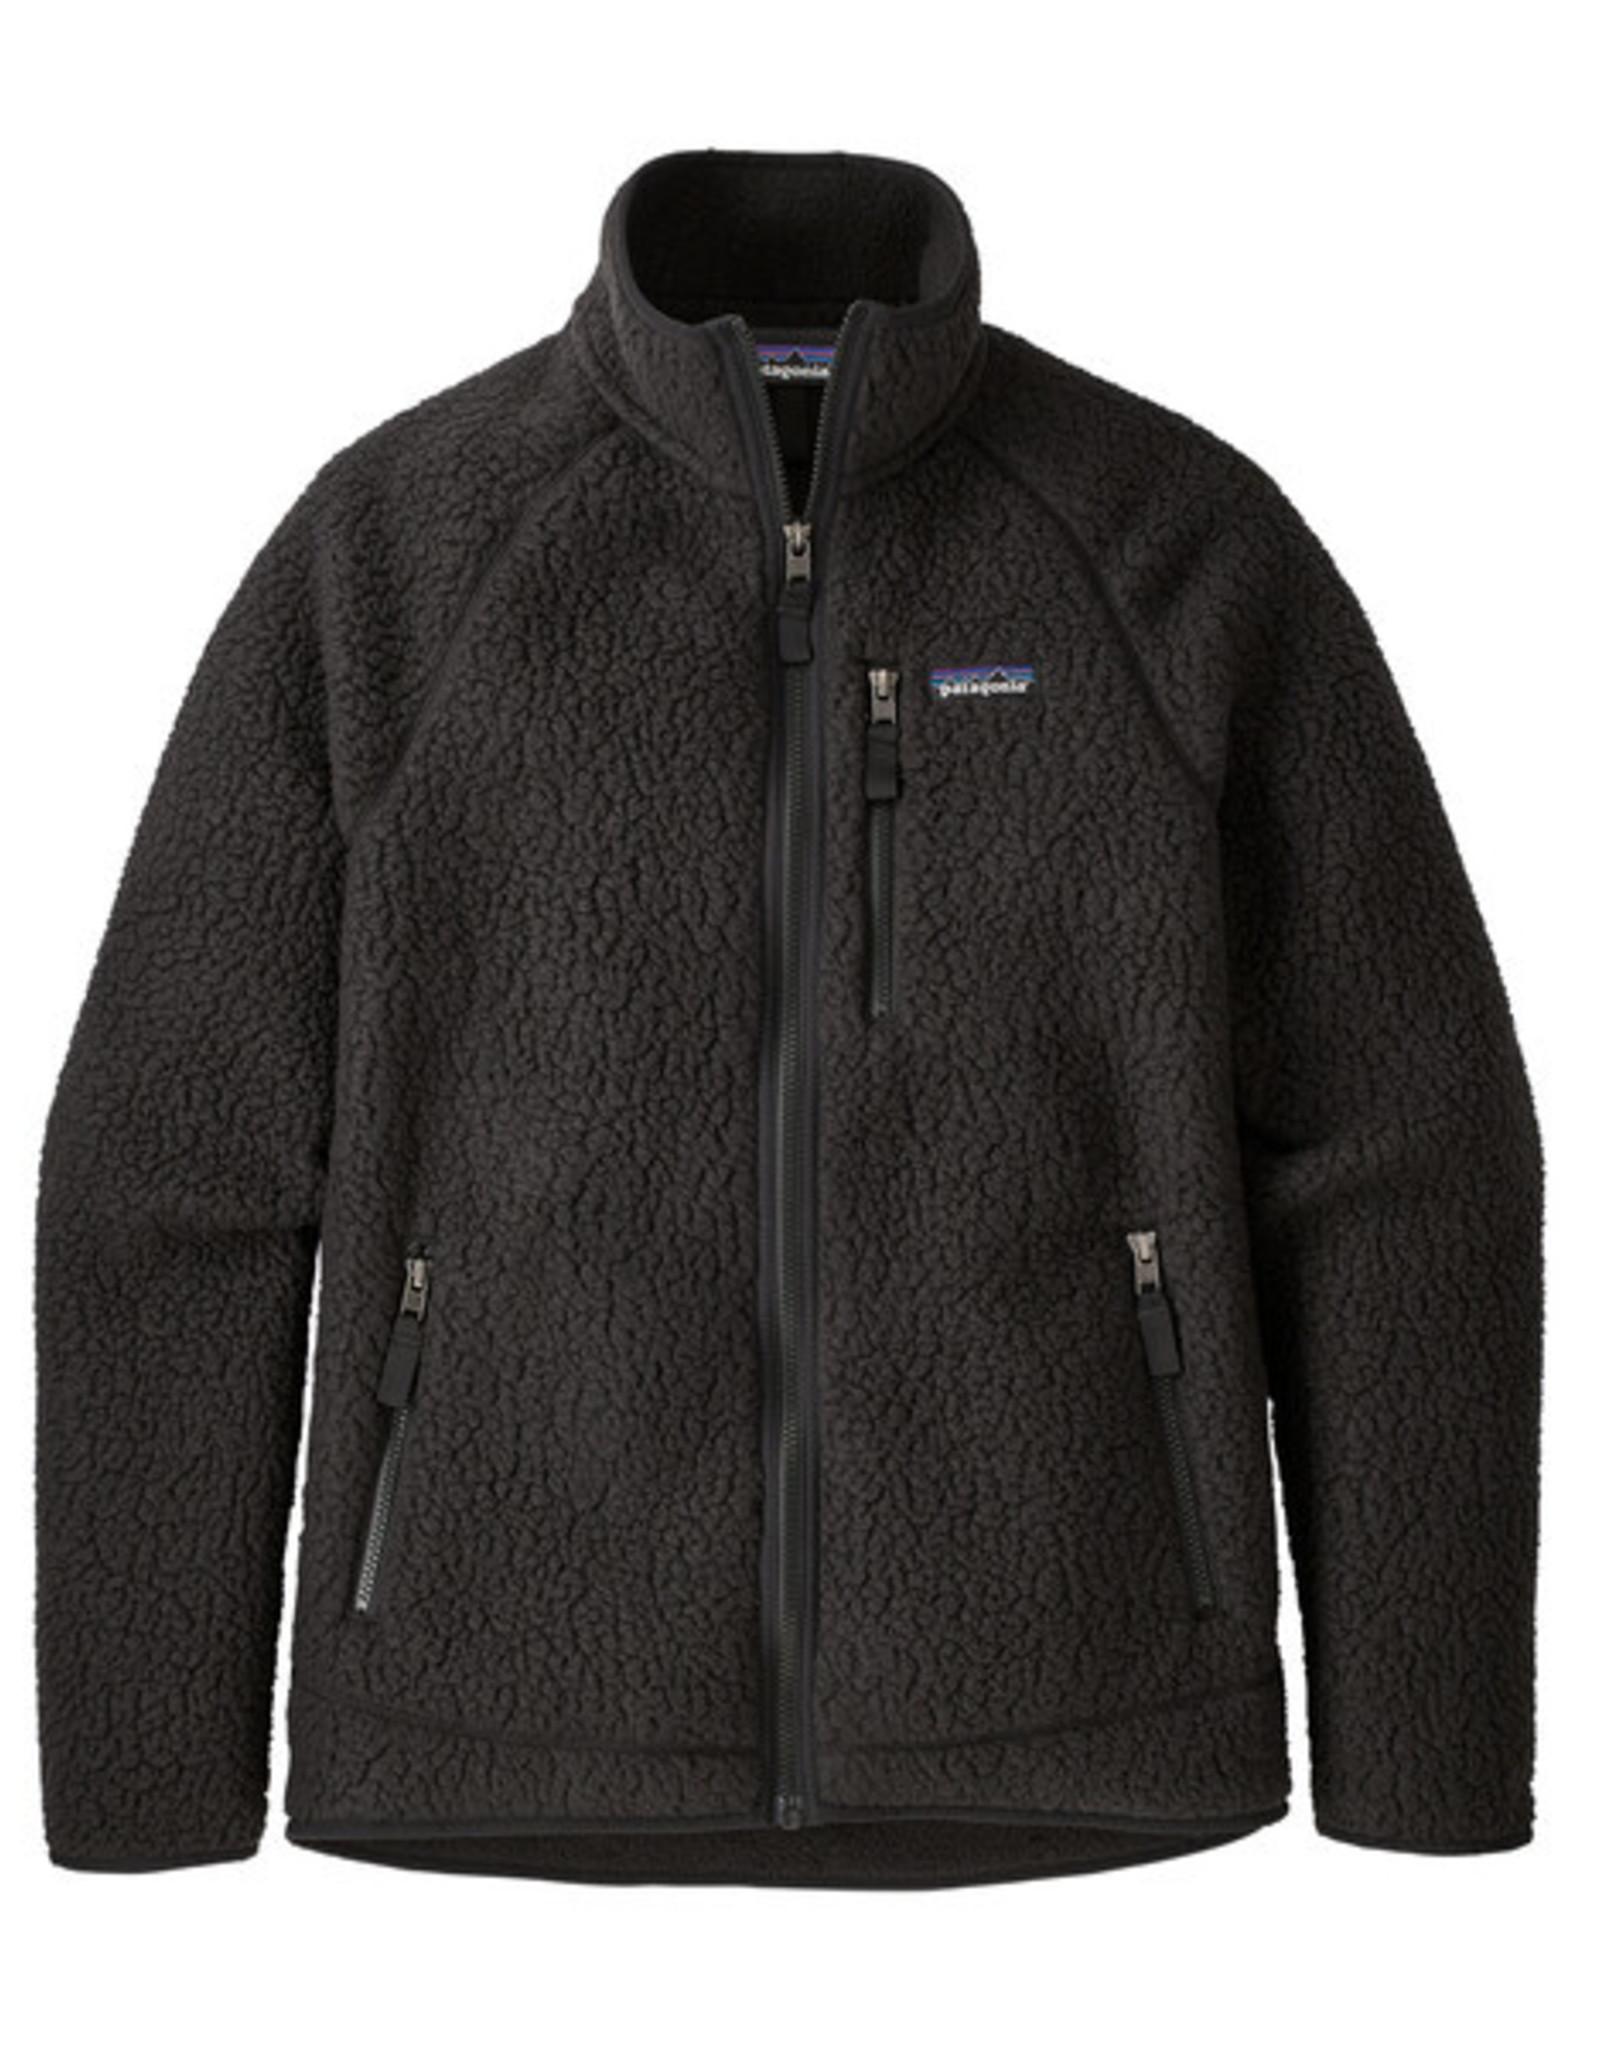 Patagonia - M's Retro Pile Jacket -